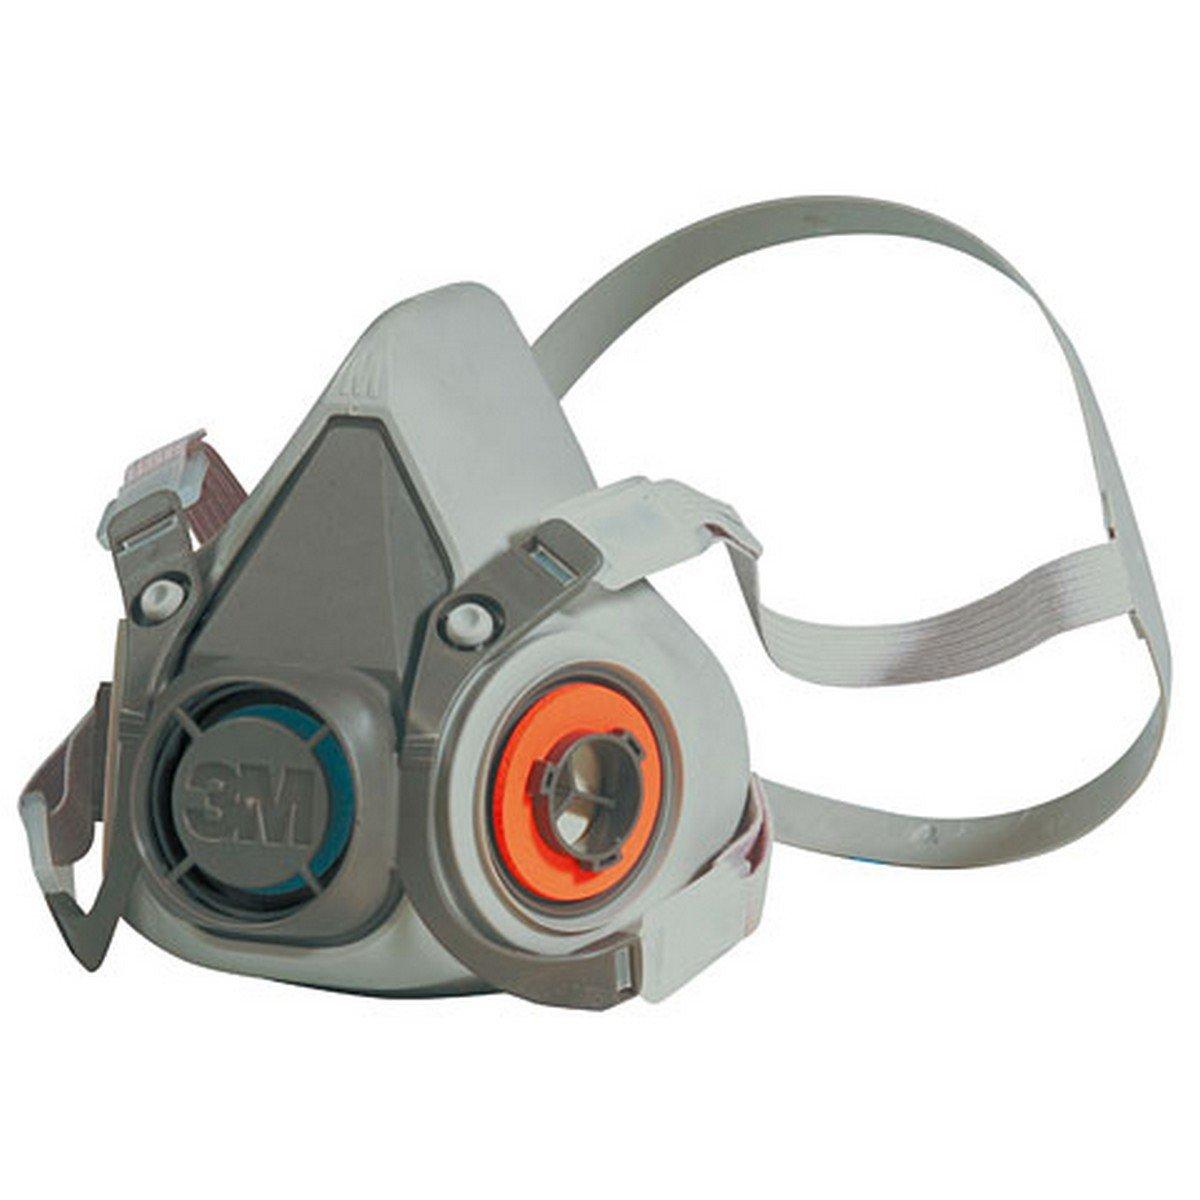 Image of 3M Half mask 3m Series 6000 A2p2 M